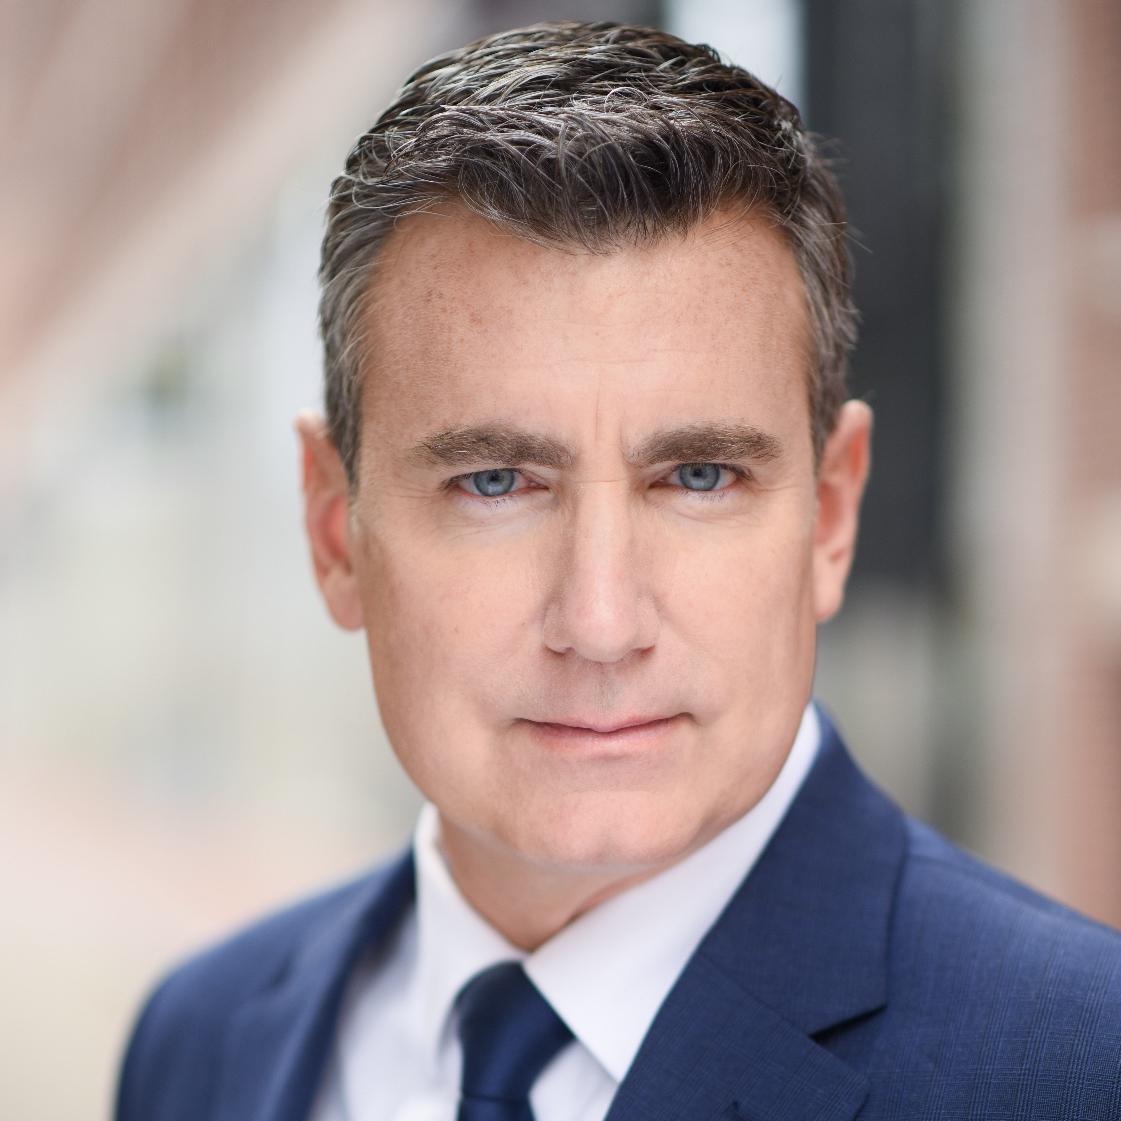 Paul Noonan